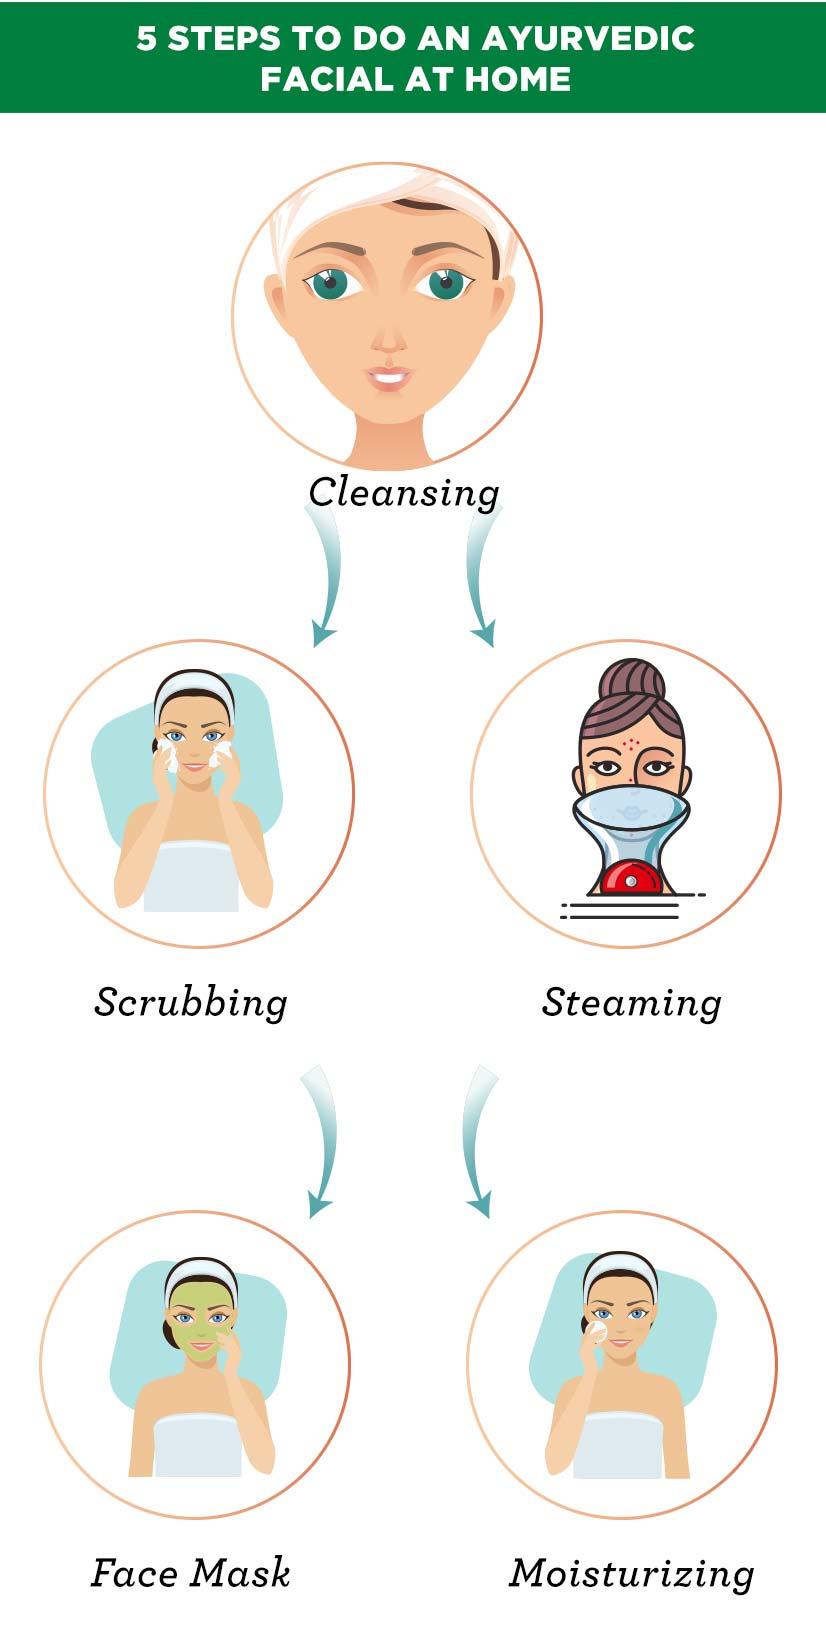 5 Steps To Do An Ayurvedic Facial At Home